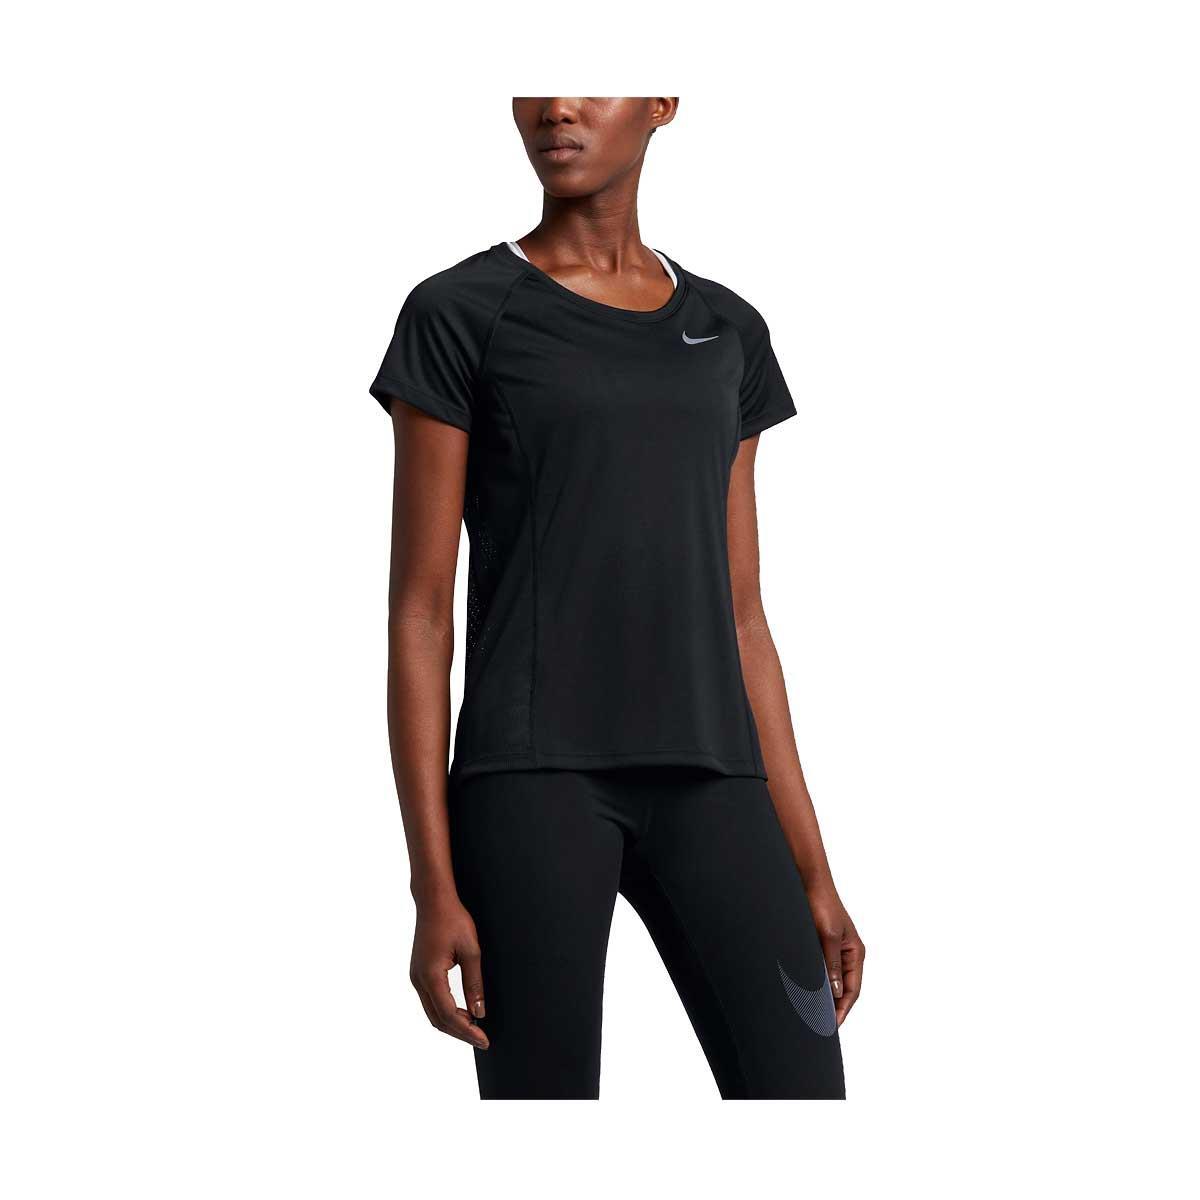 e5a8422cb040e Camiseta Nike Dry Miler Crew Feminina